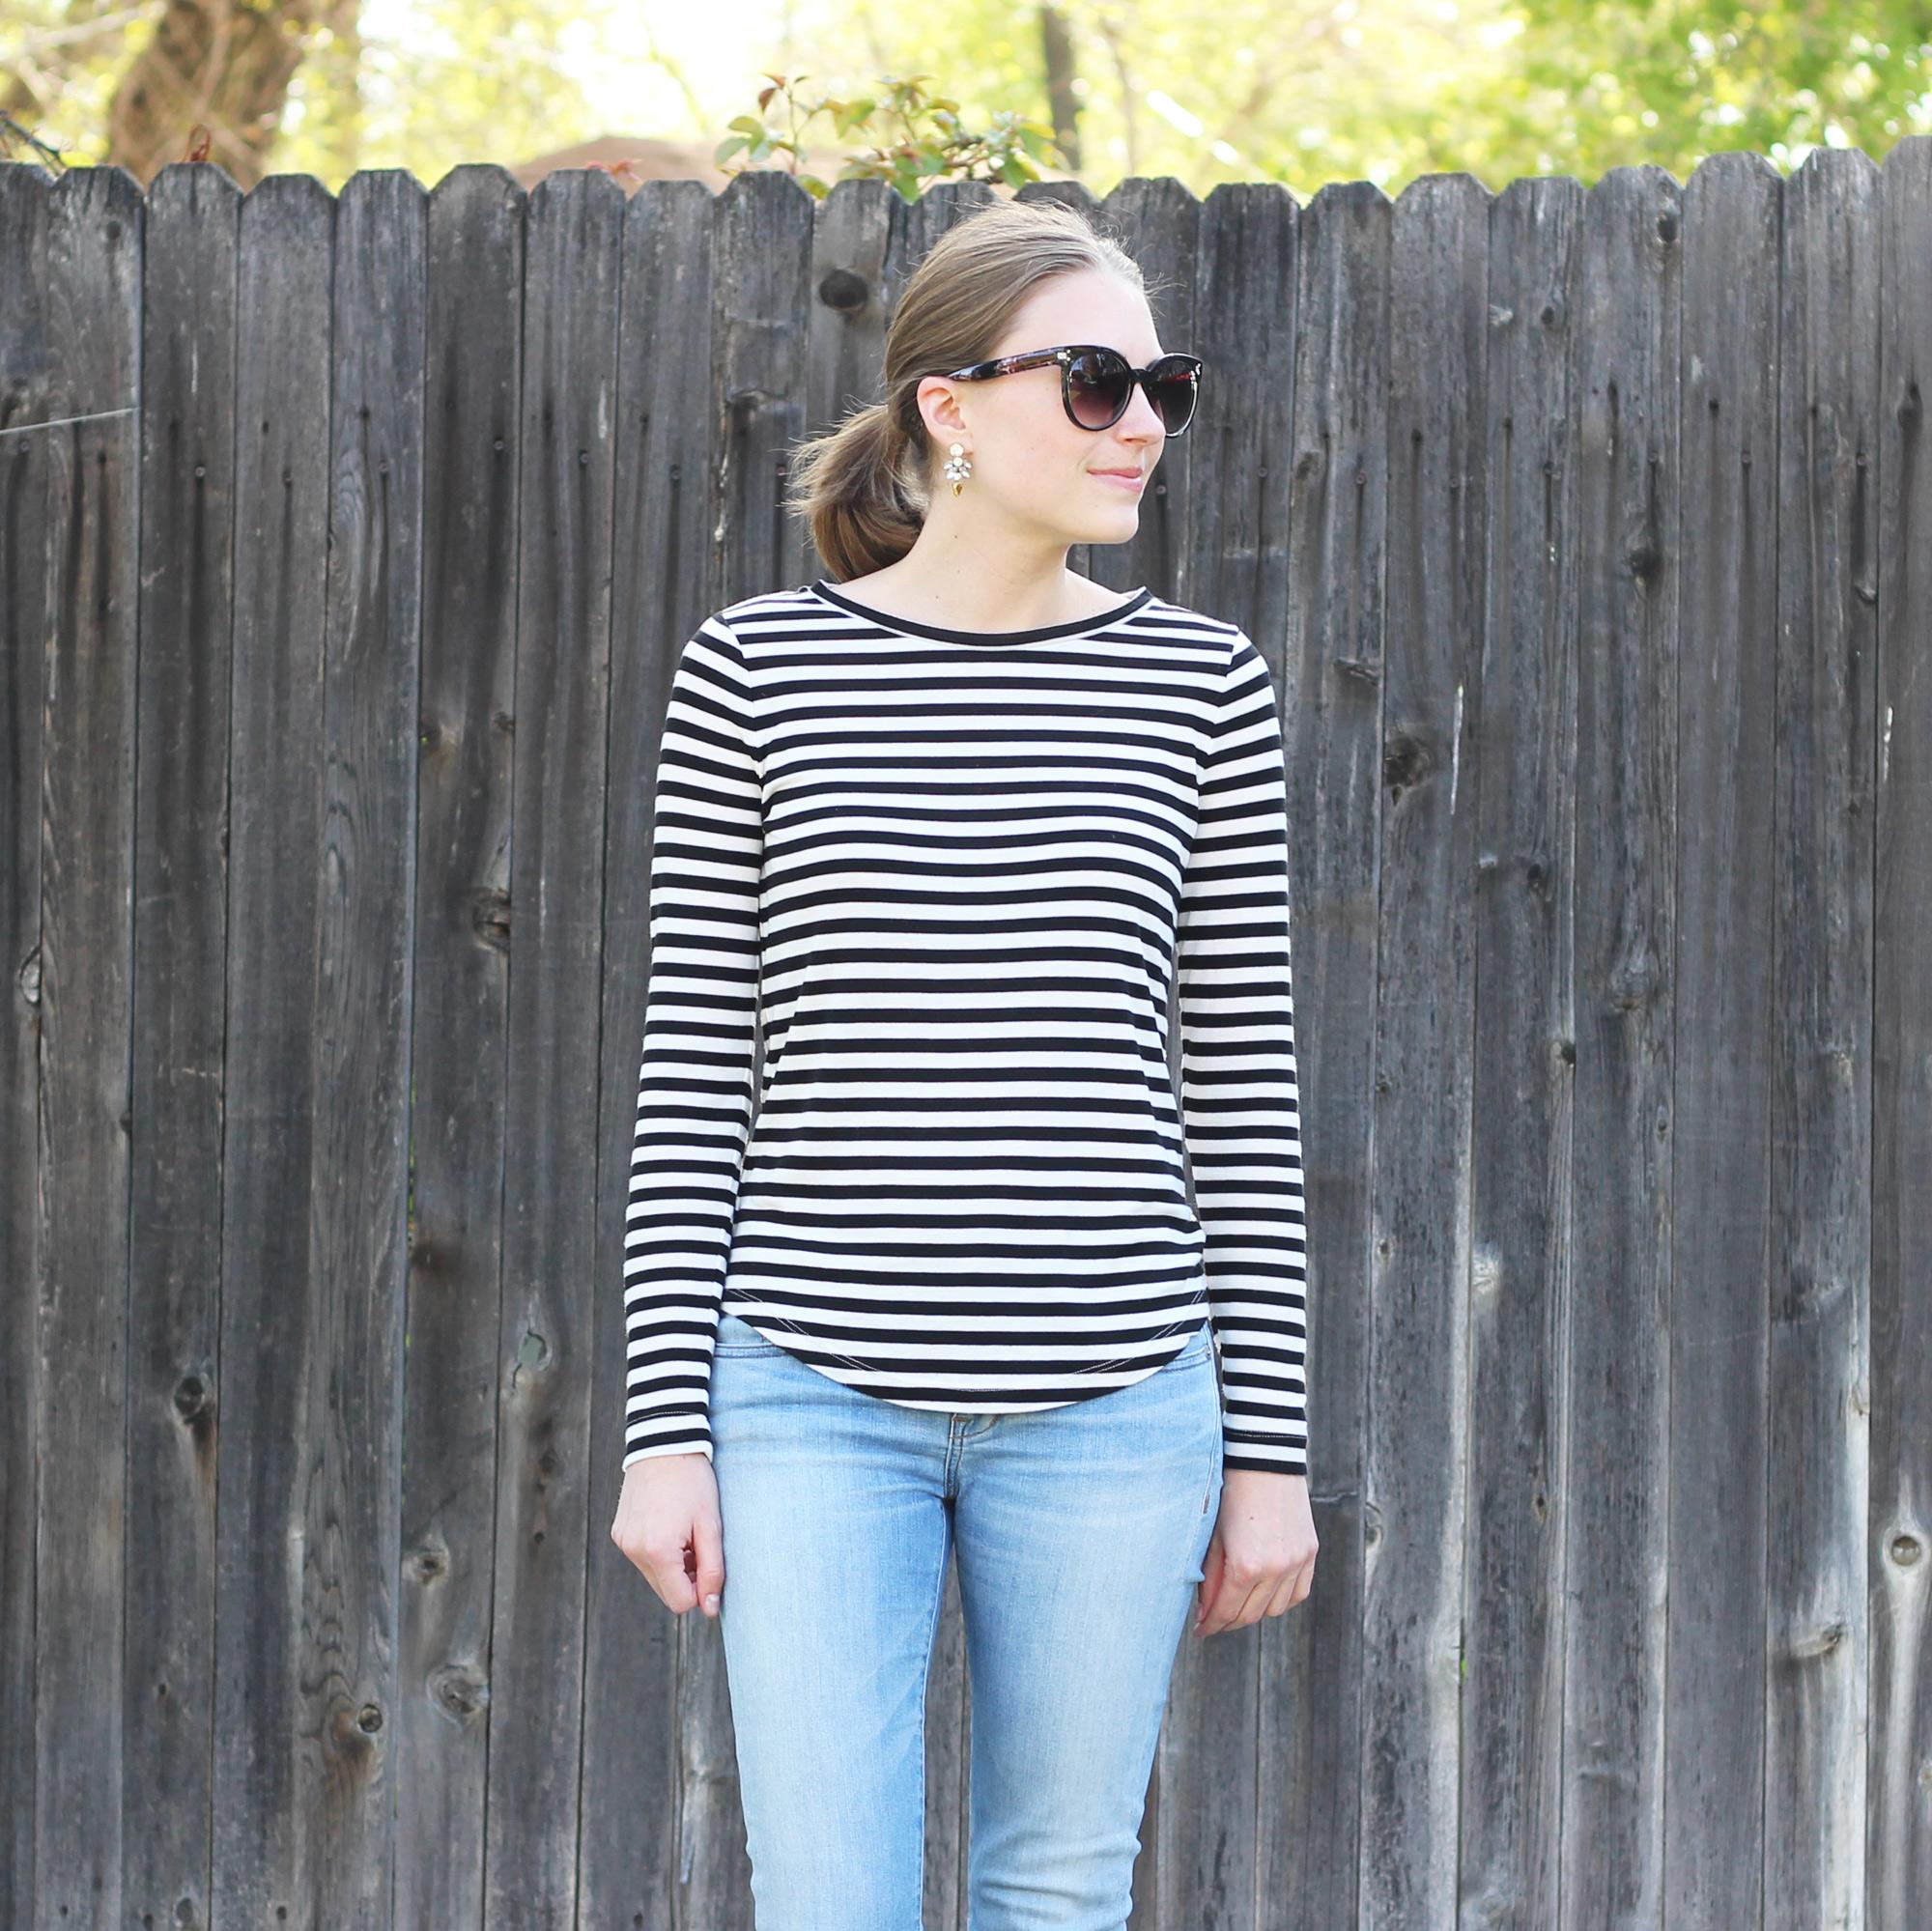 Statement earrings + striped tee + light wash denim — Cotton Cashmere Cat Hair